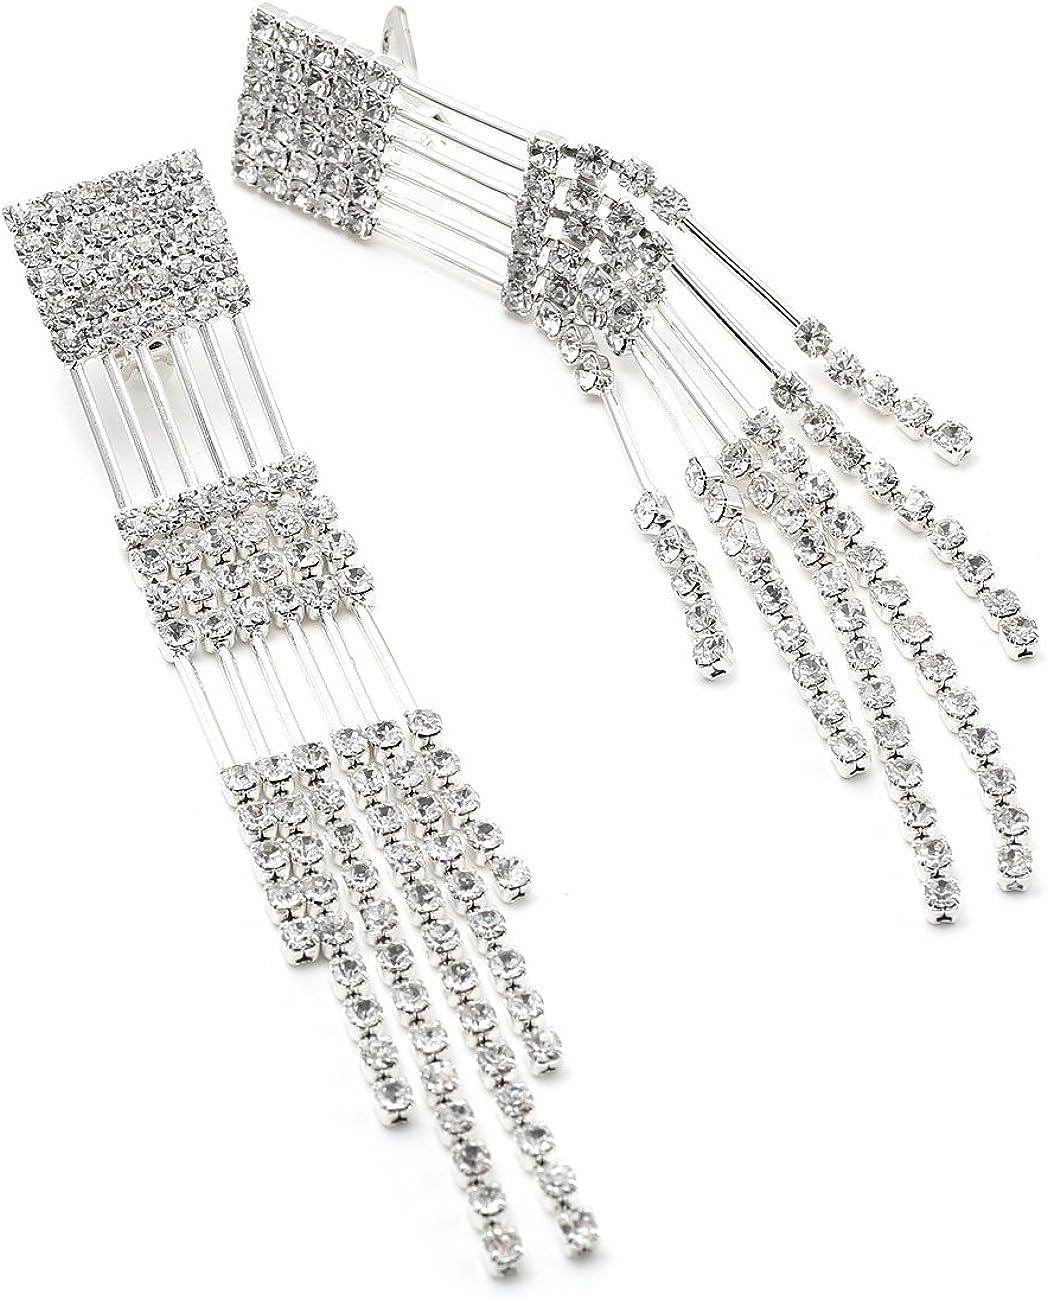 DiamondJewelryNY Silver Pendant Ss Long Lngth Cz Blk Rhod//Wht Neck 36